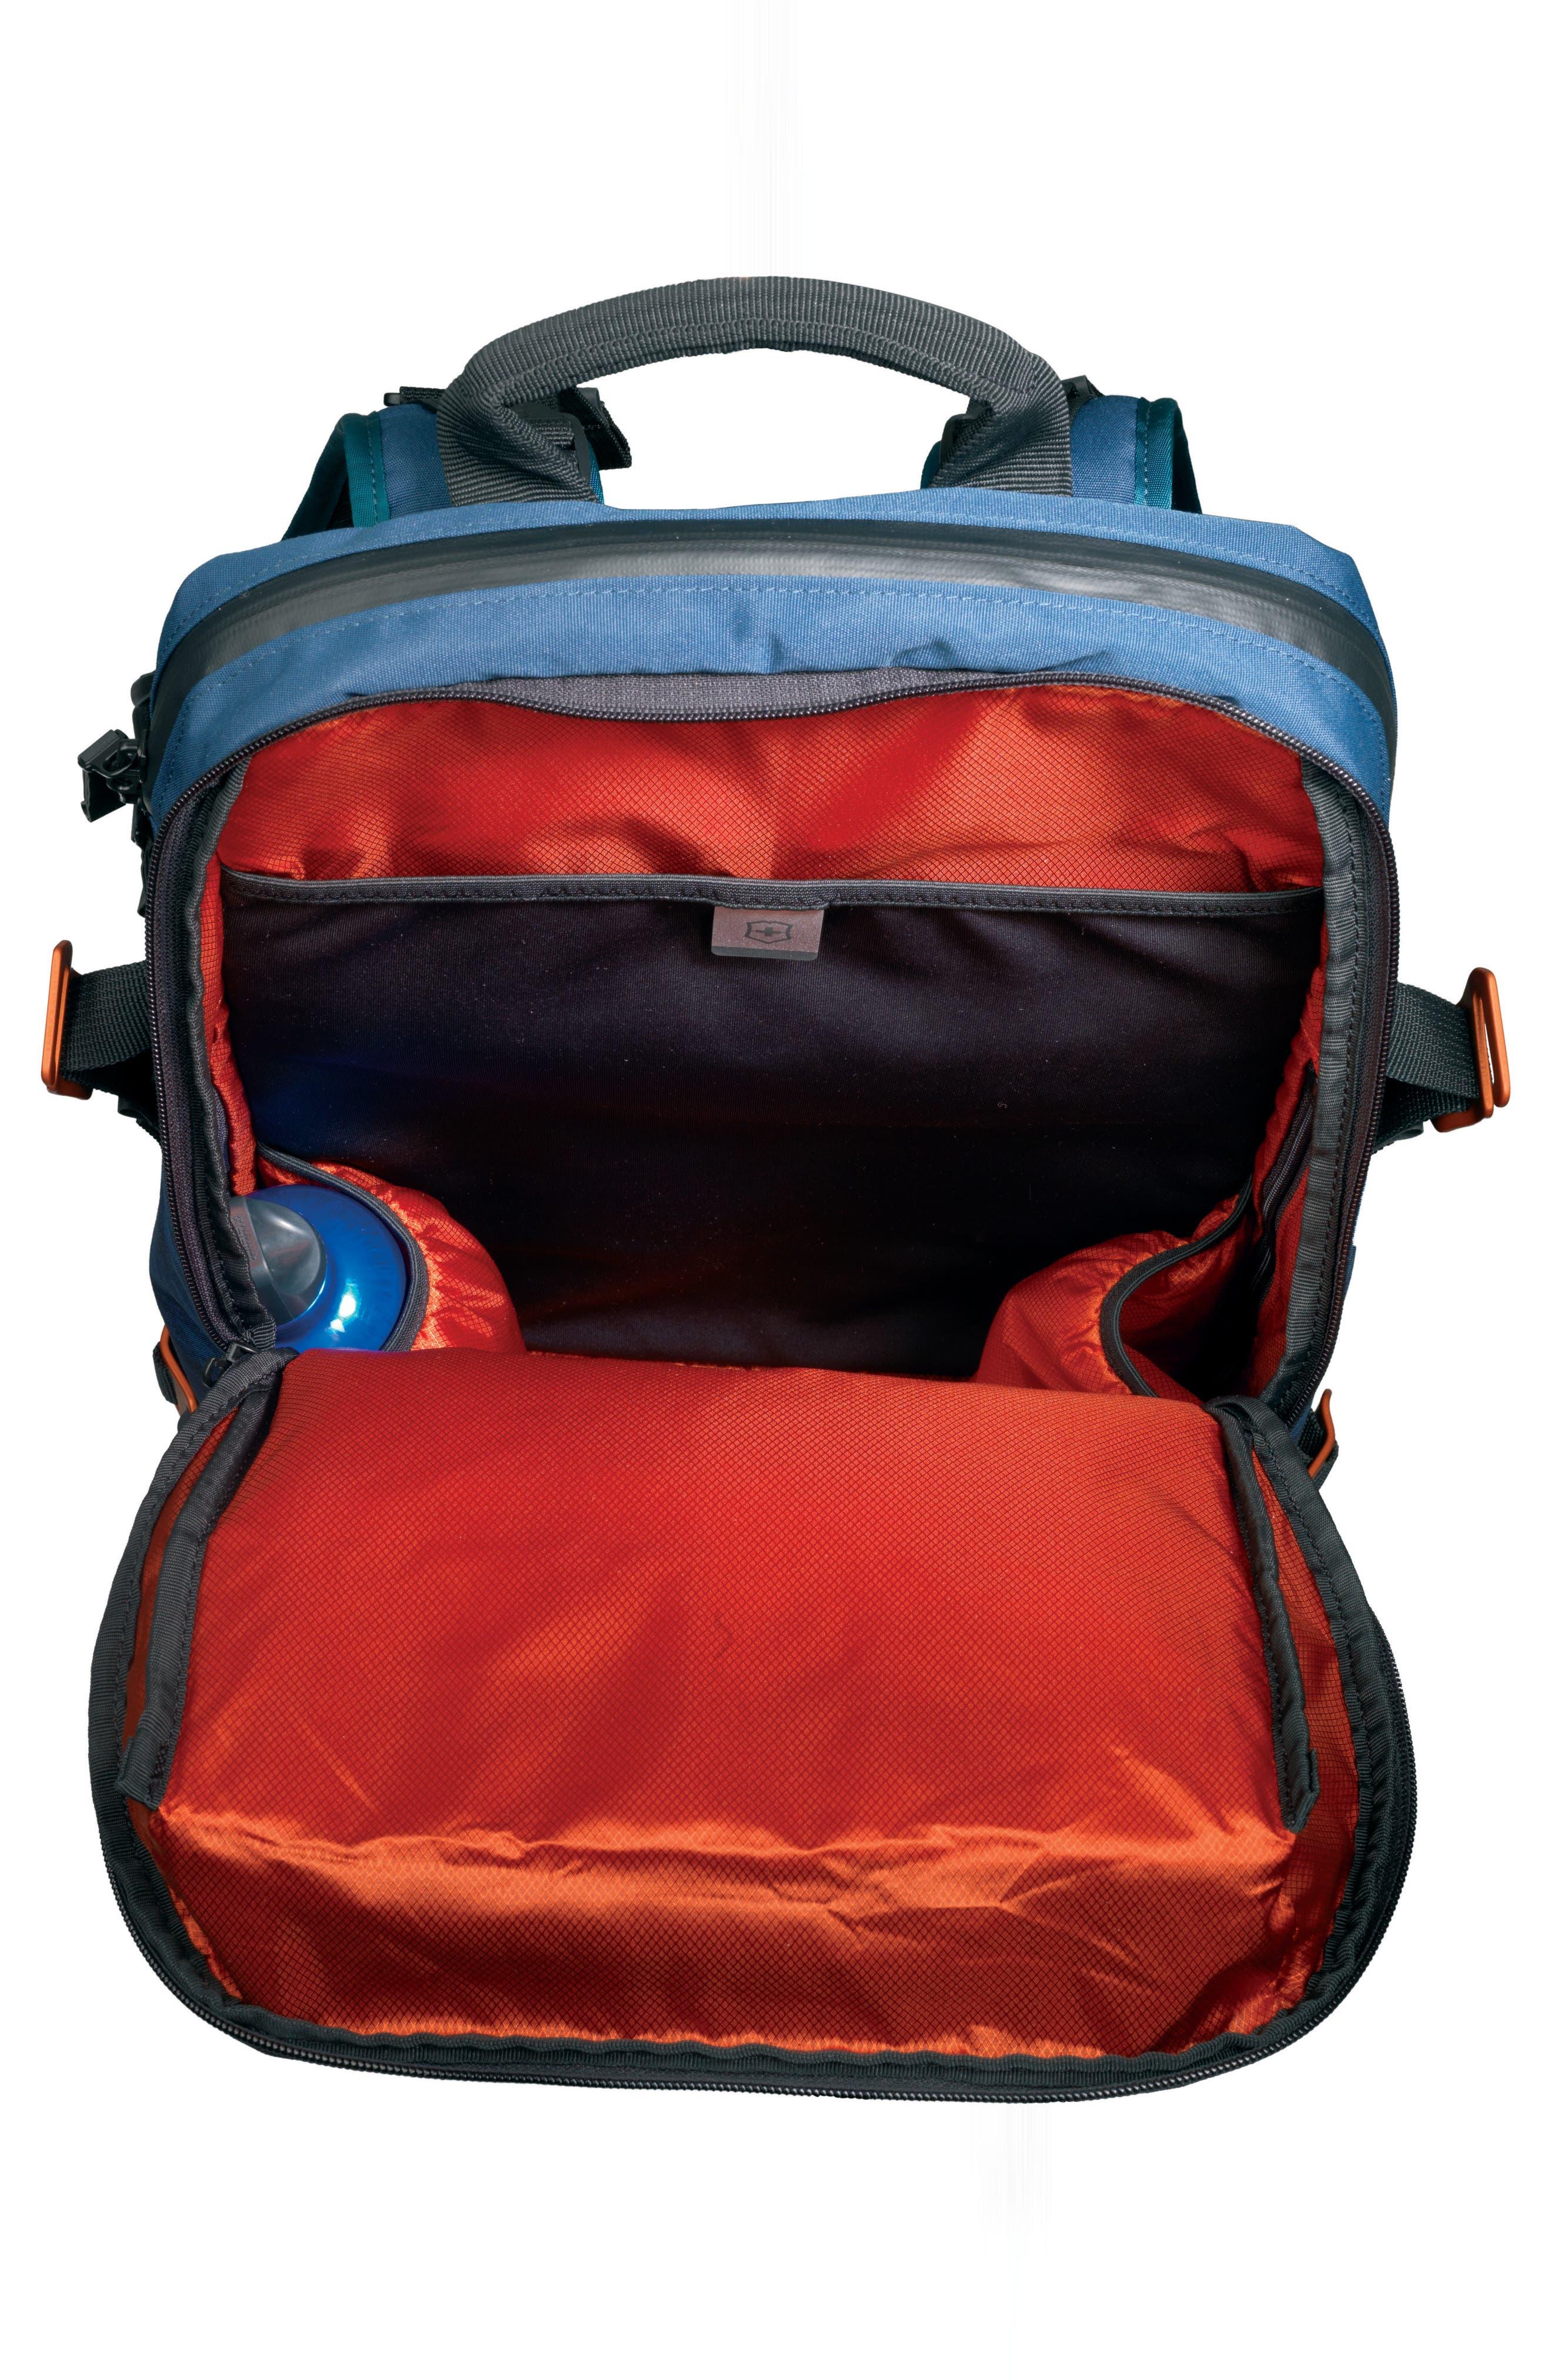 VX Touring Laptop Backpack,                             Alternate thumbnail 2, color,                             DARK TEAL